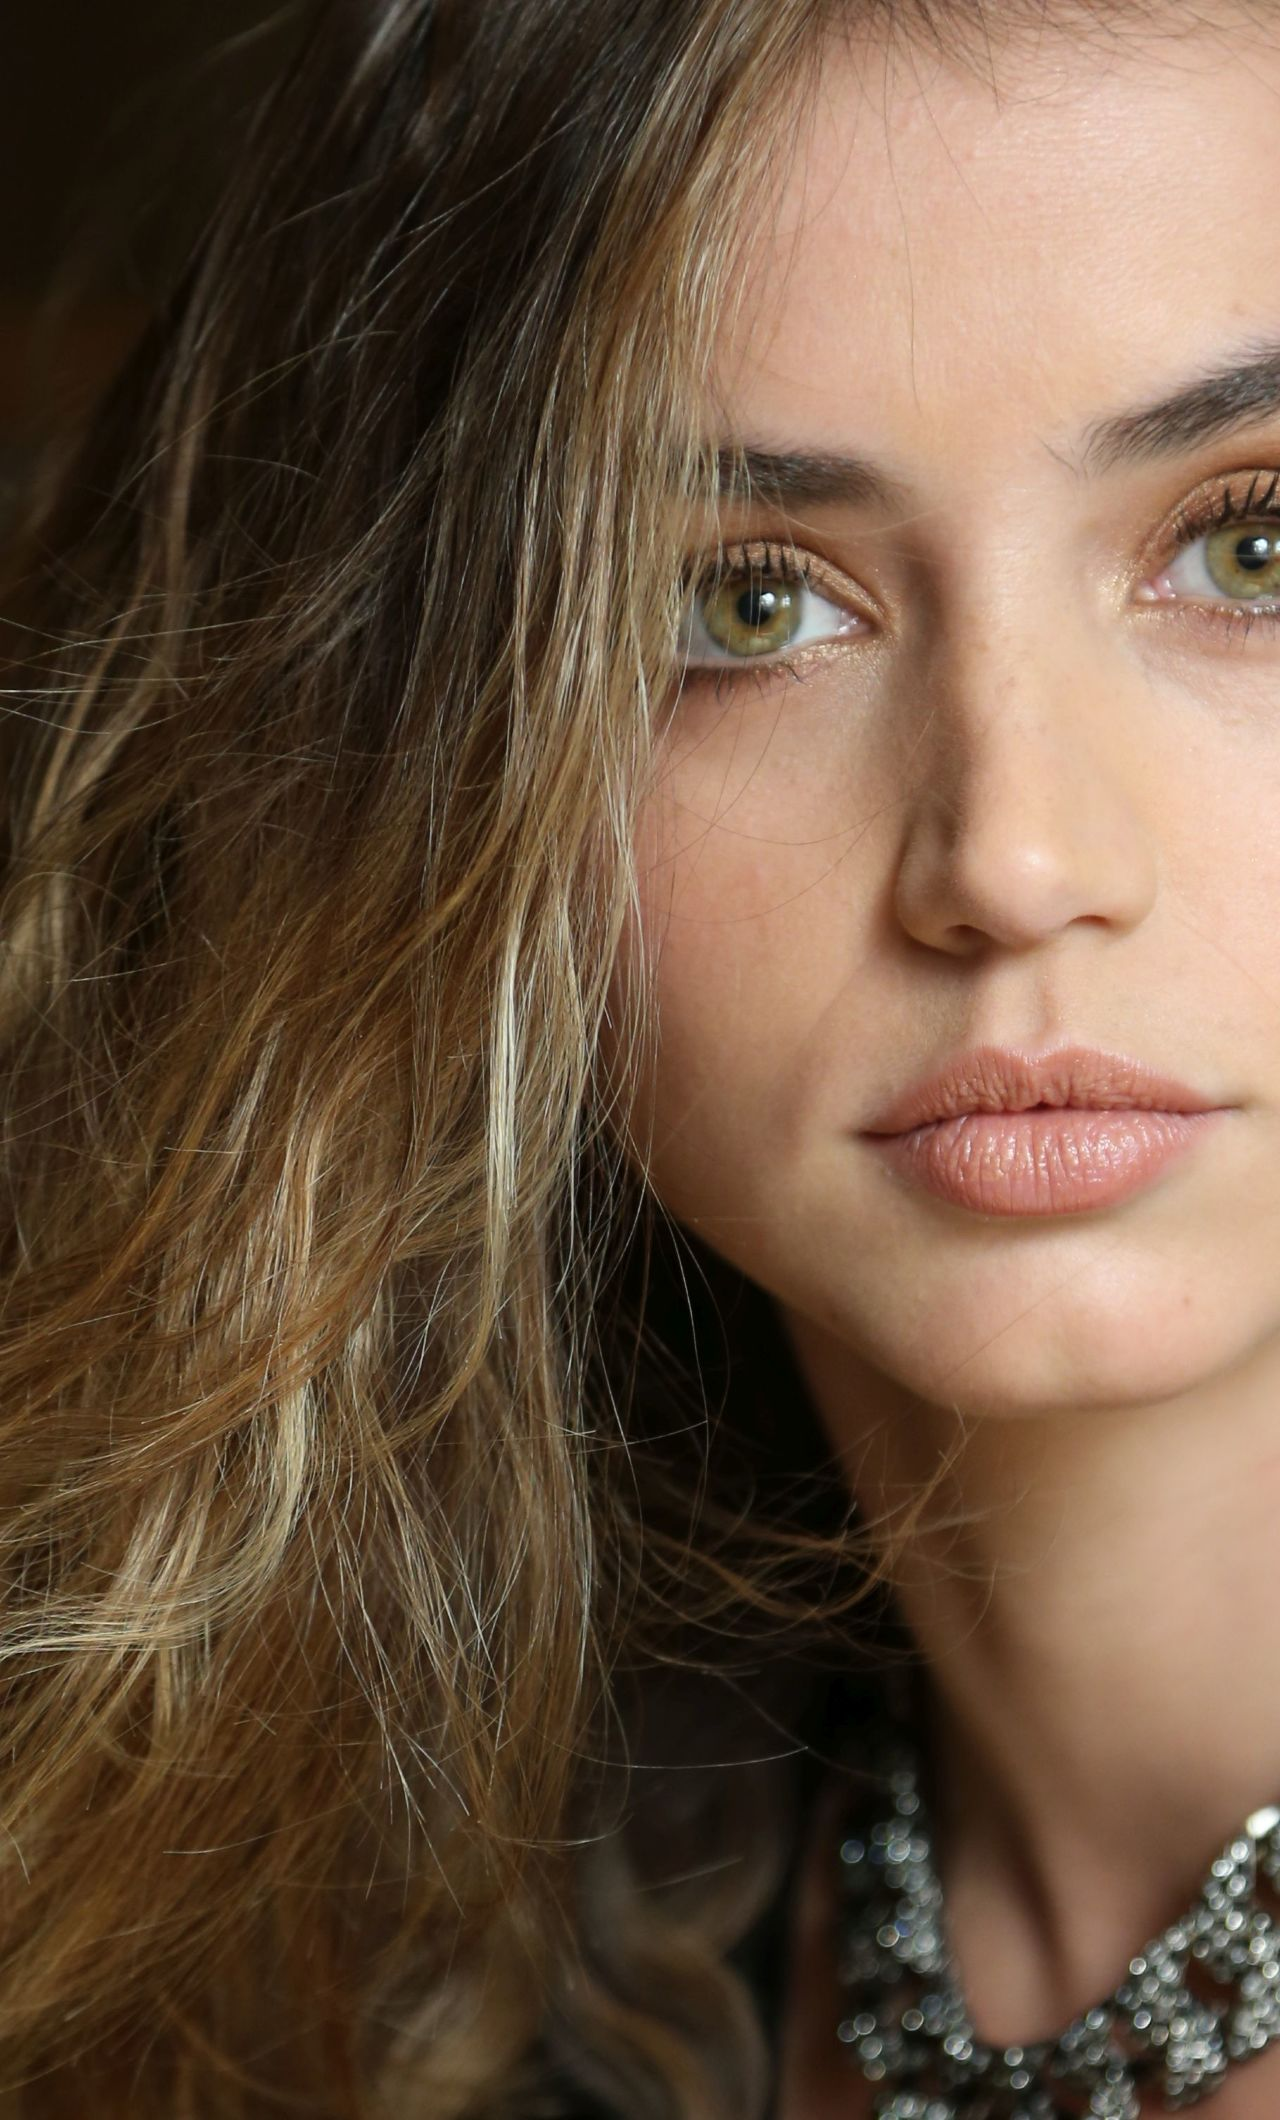 Ana De Armas Beautiful Face, HD 4K Wallpaper